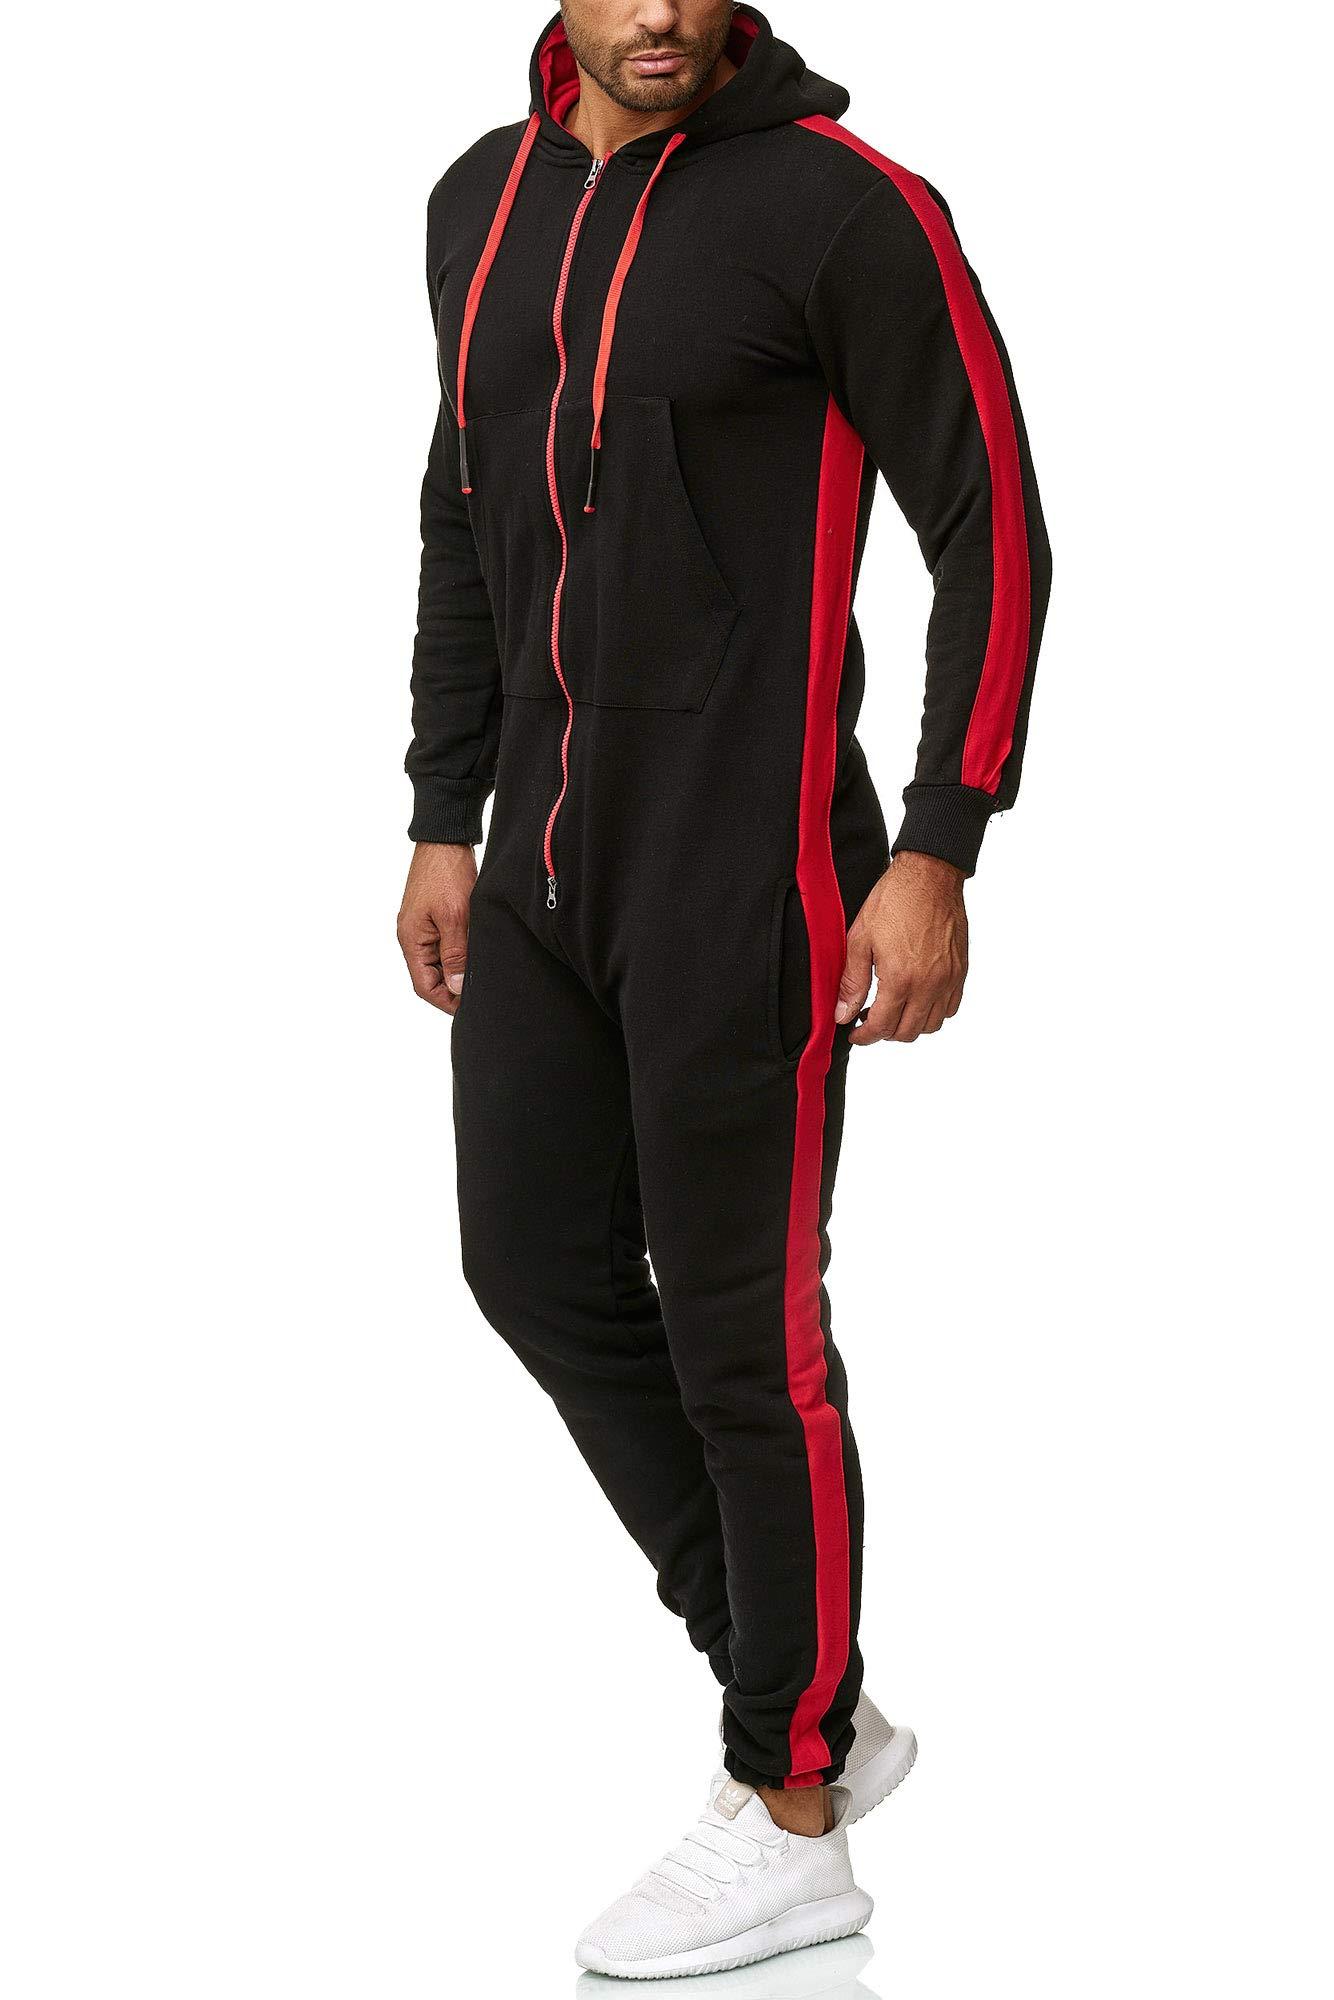 OneRedox Herren Trainingsanzug Unisex Jogger Jumpsuit Jogging Anzug Overall Einteiler Modell 1257